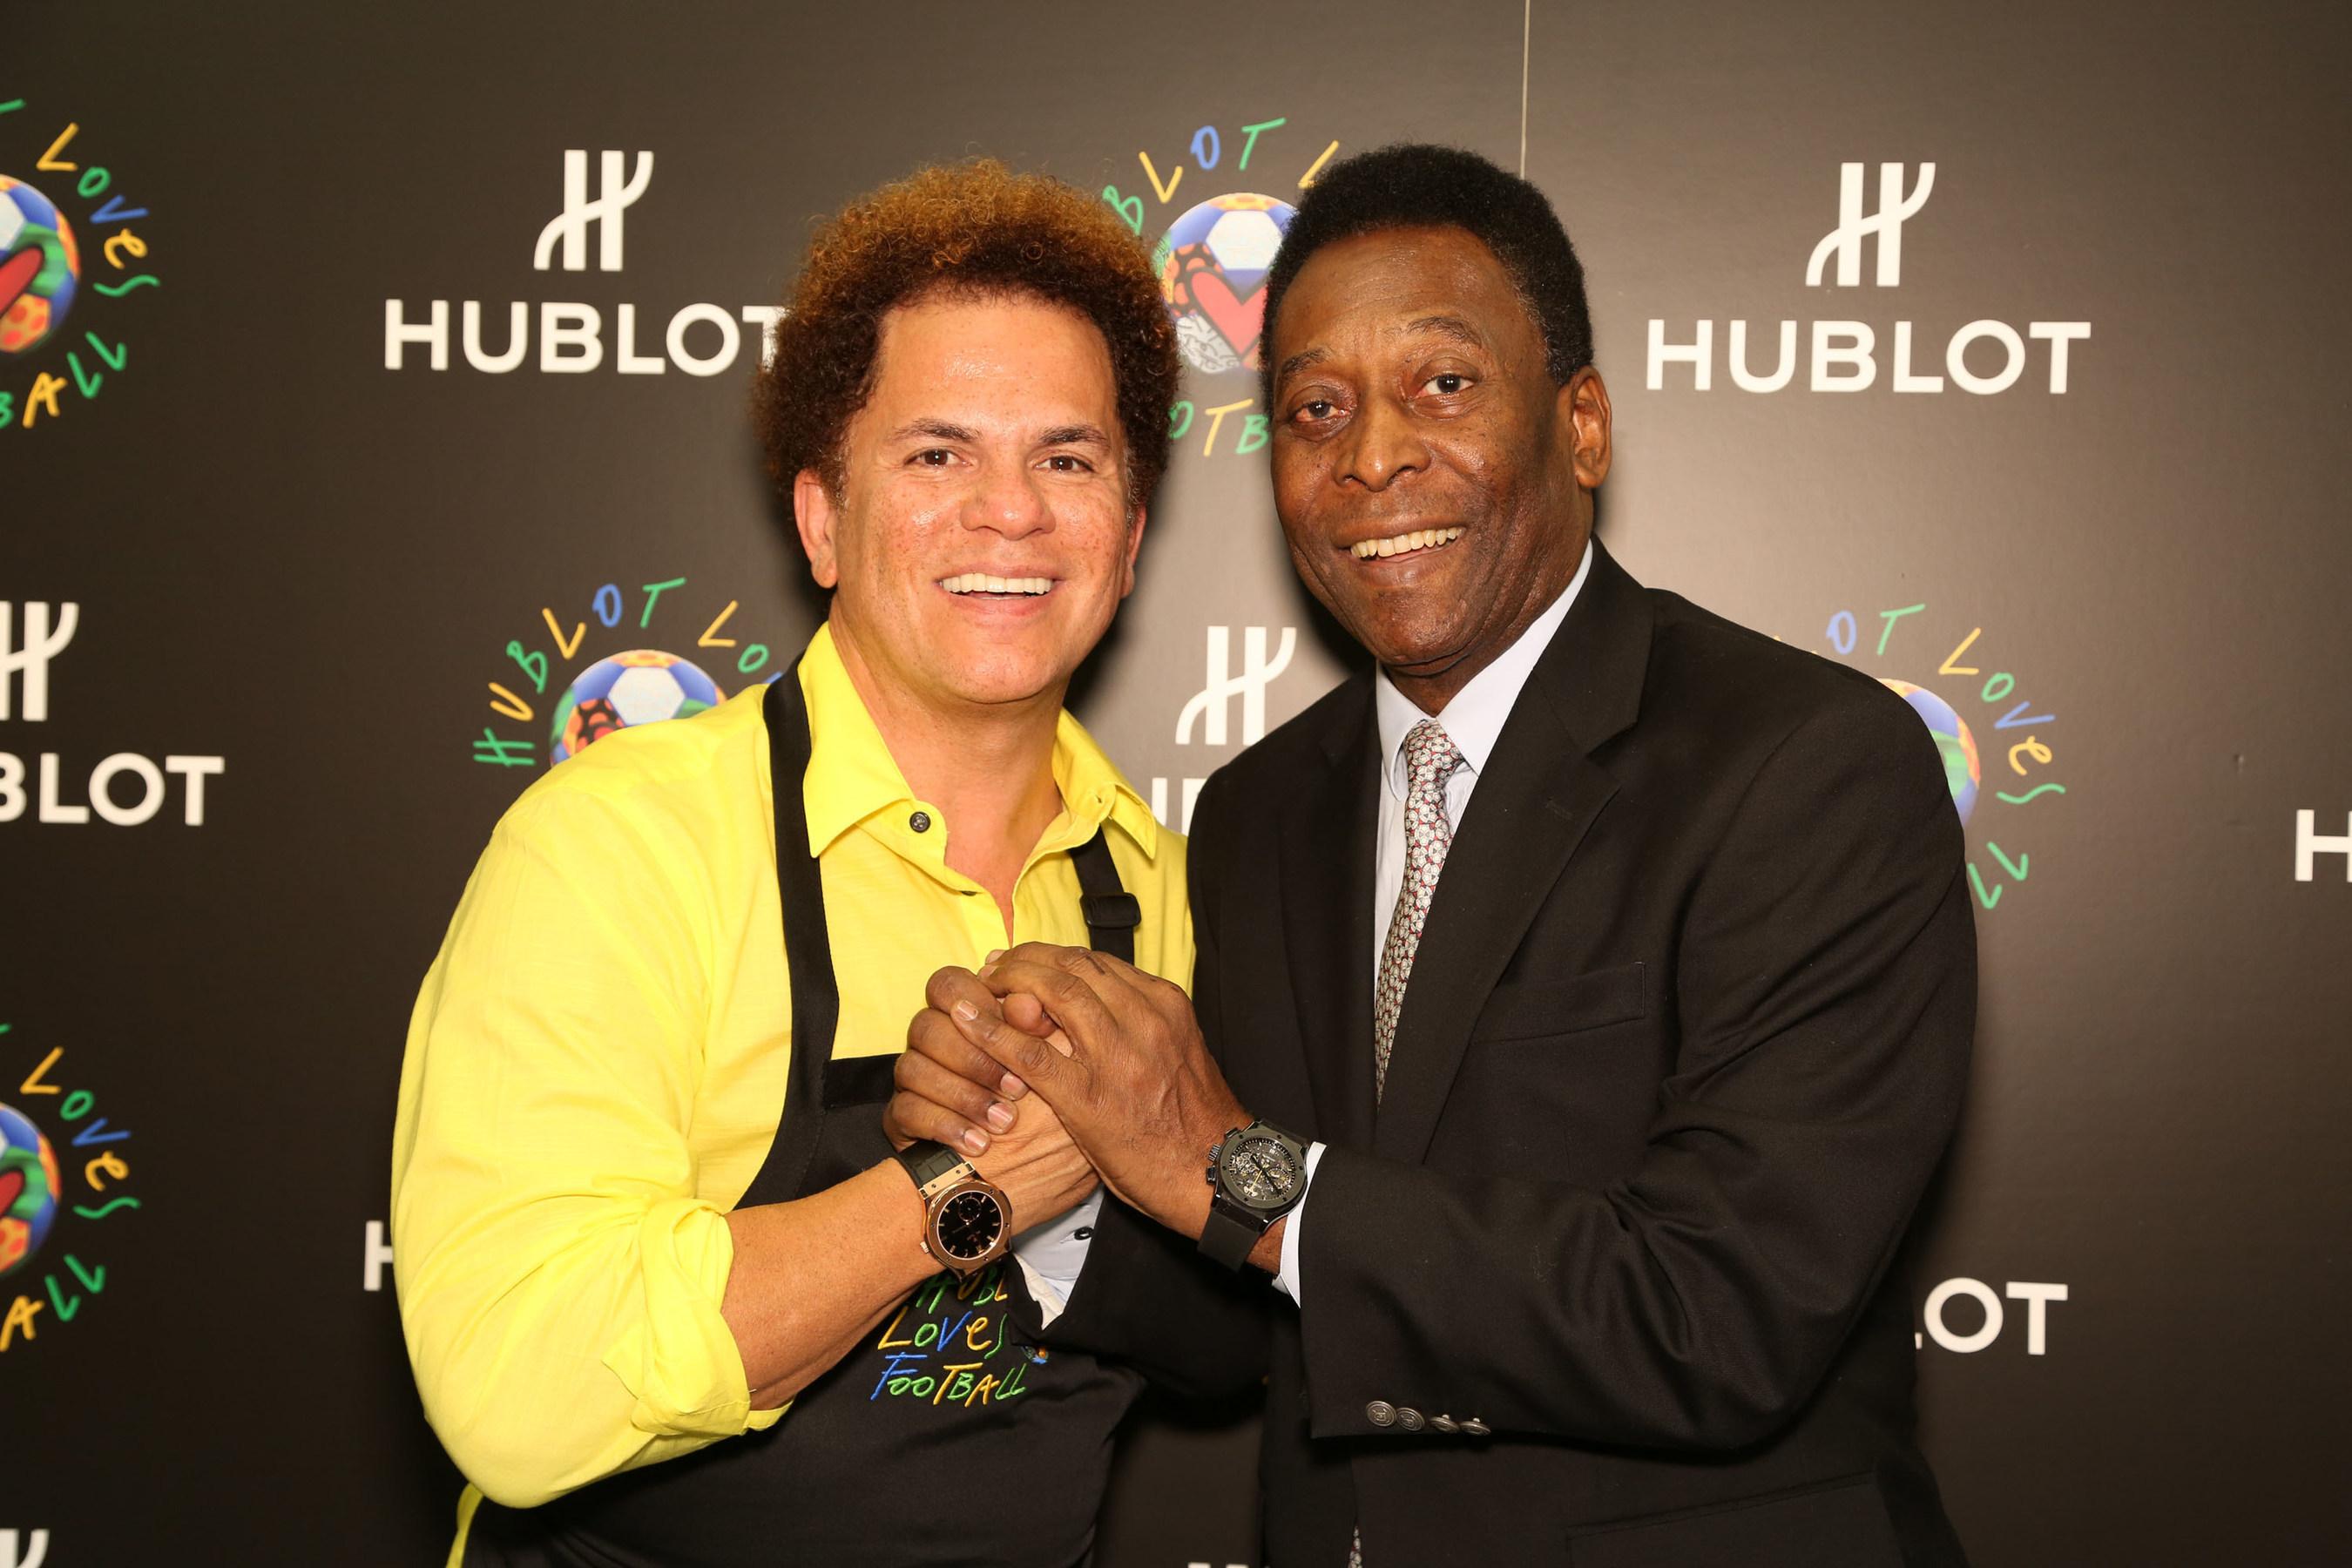 Pop artist and Ambassador to 2016 Rio Olympic Games, Romero Britto, with legendary Brazilian soccer player, Pele.